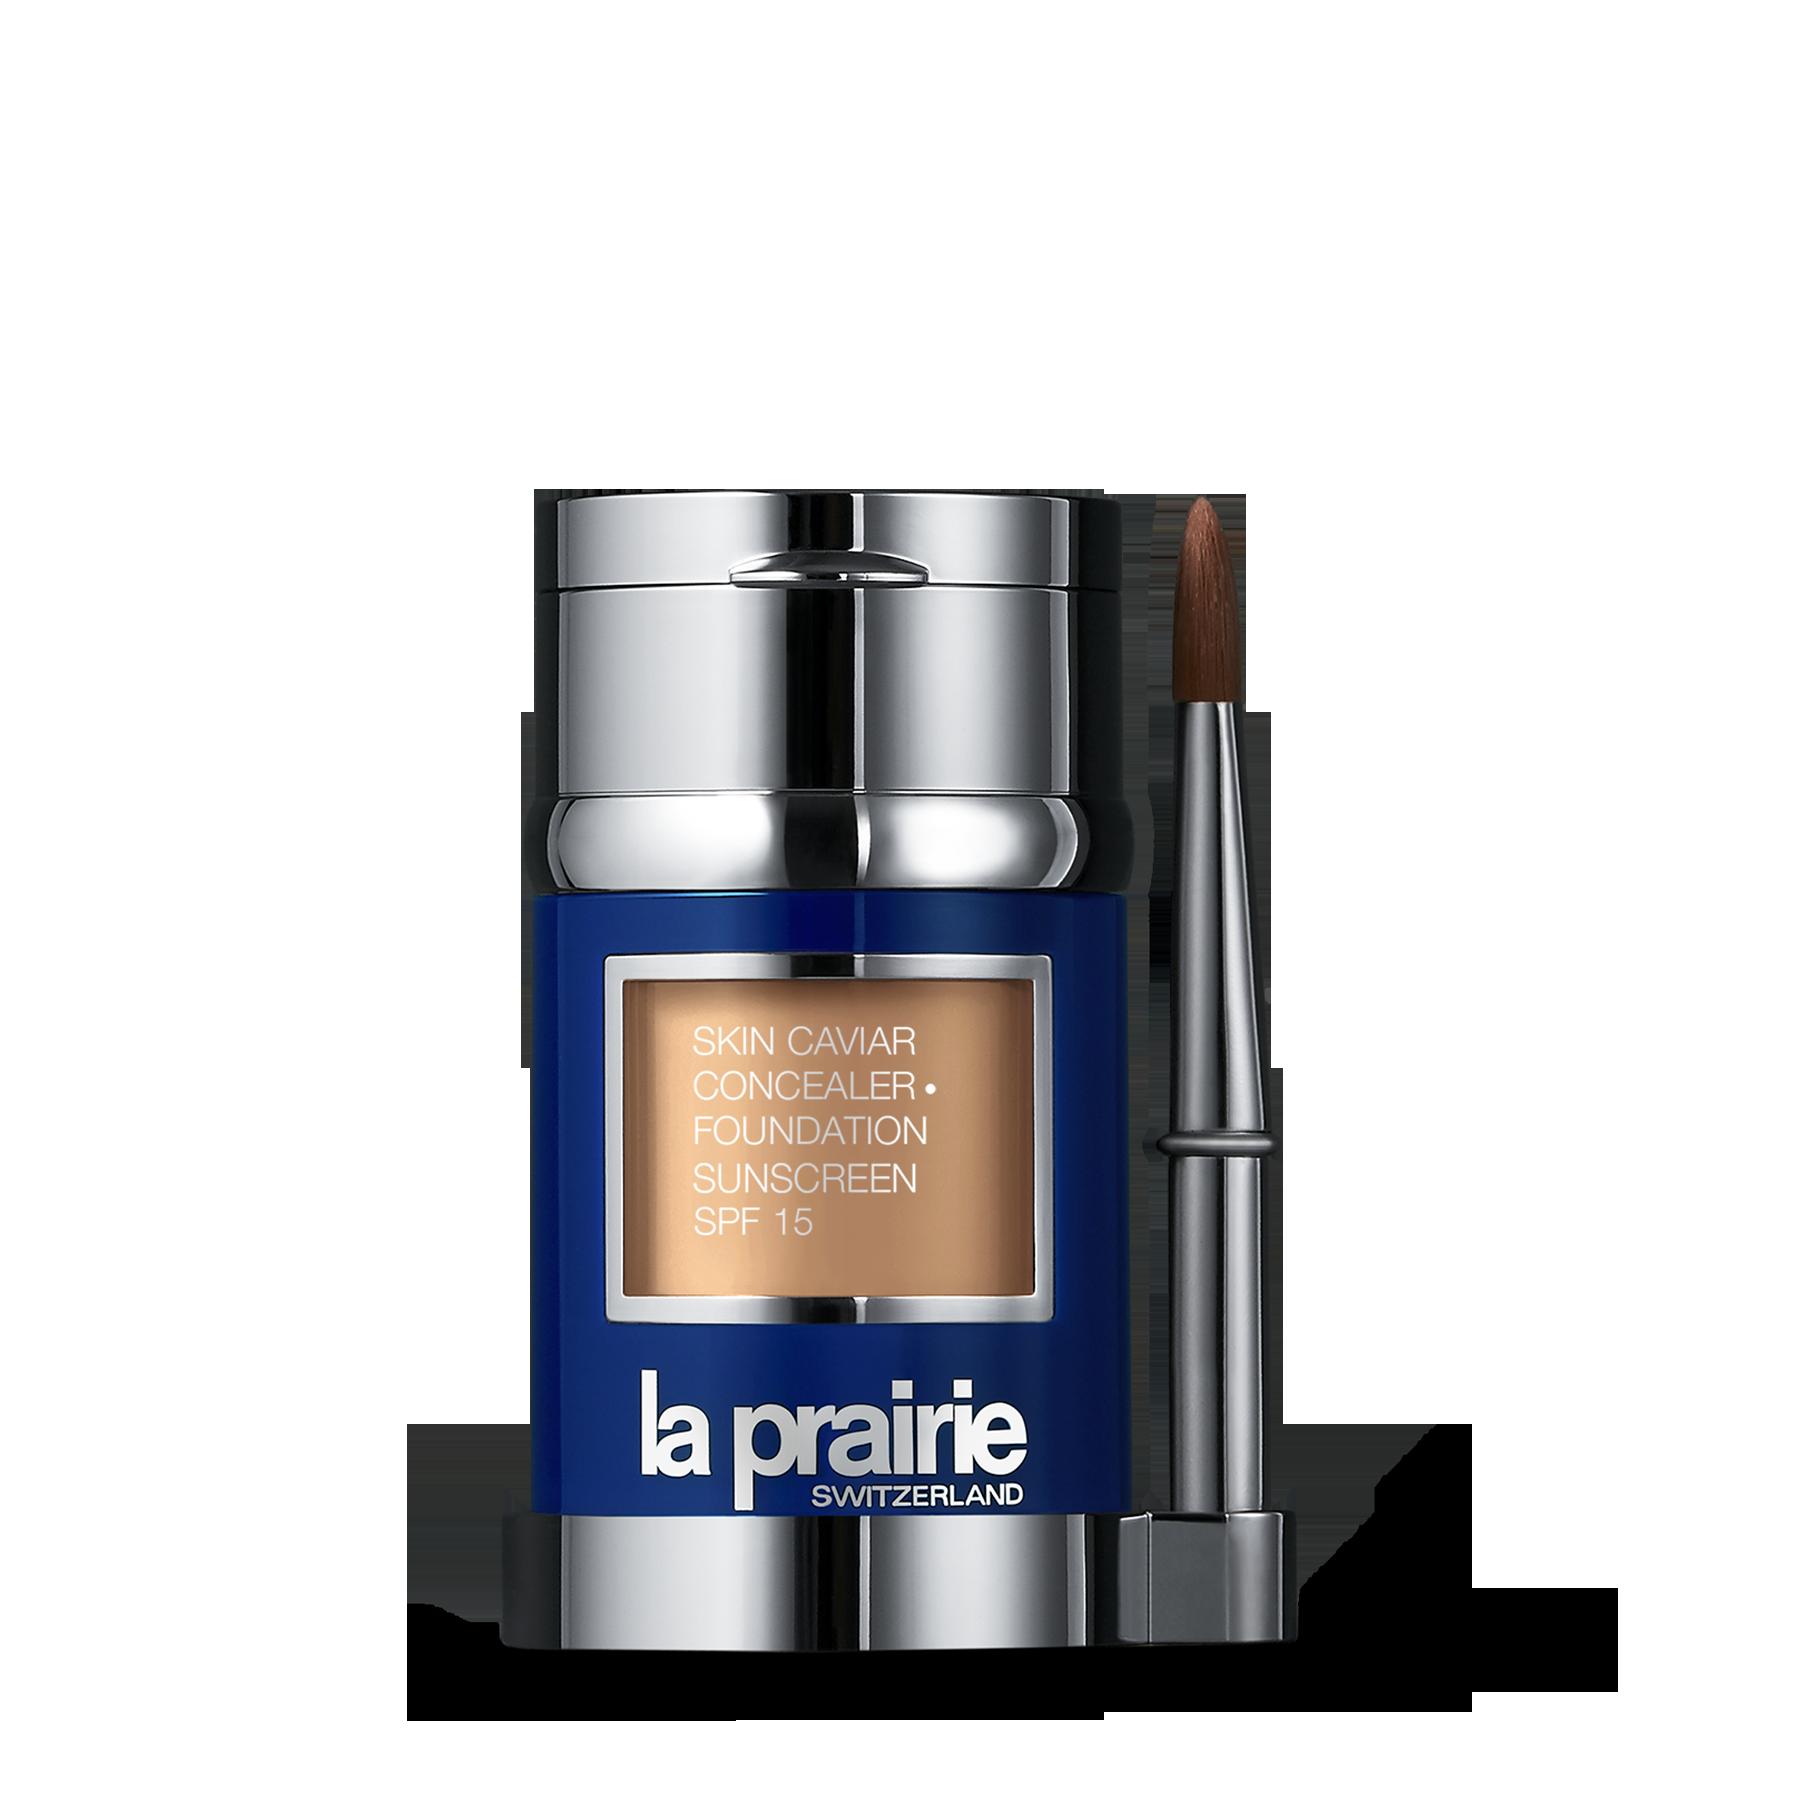 Skin Caviar Concealer Foundation Spf 15 Make Up La Prairie